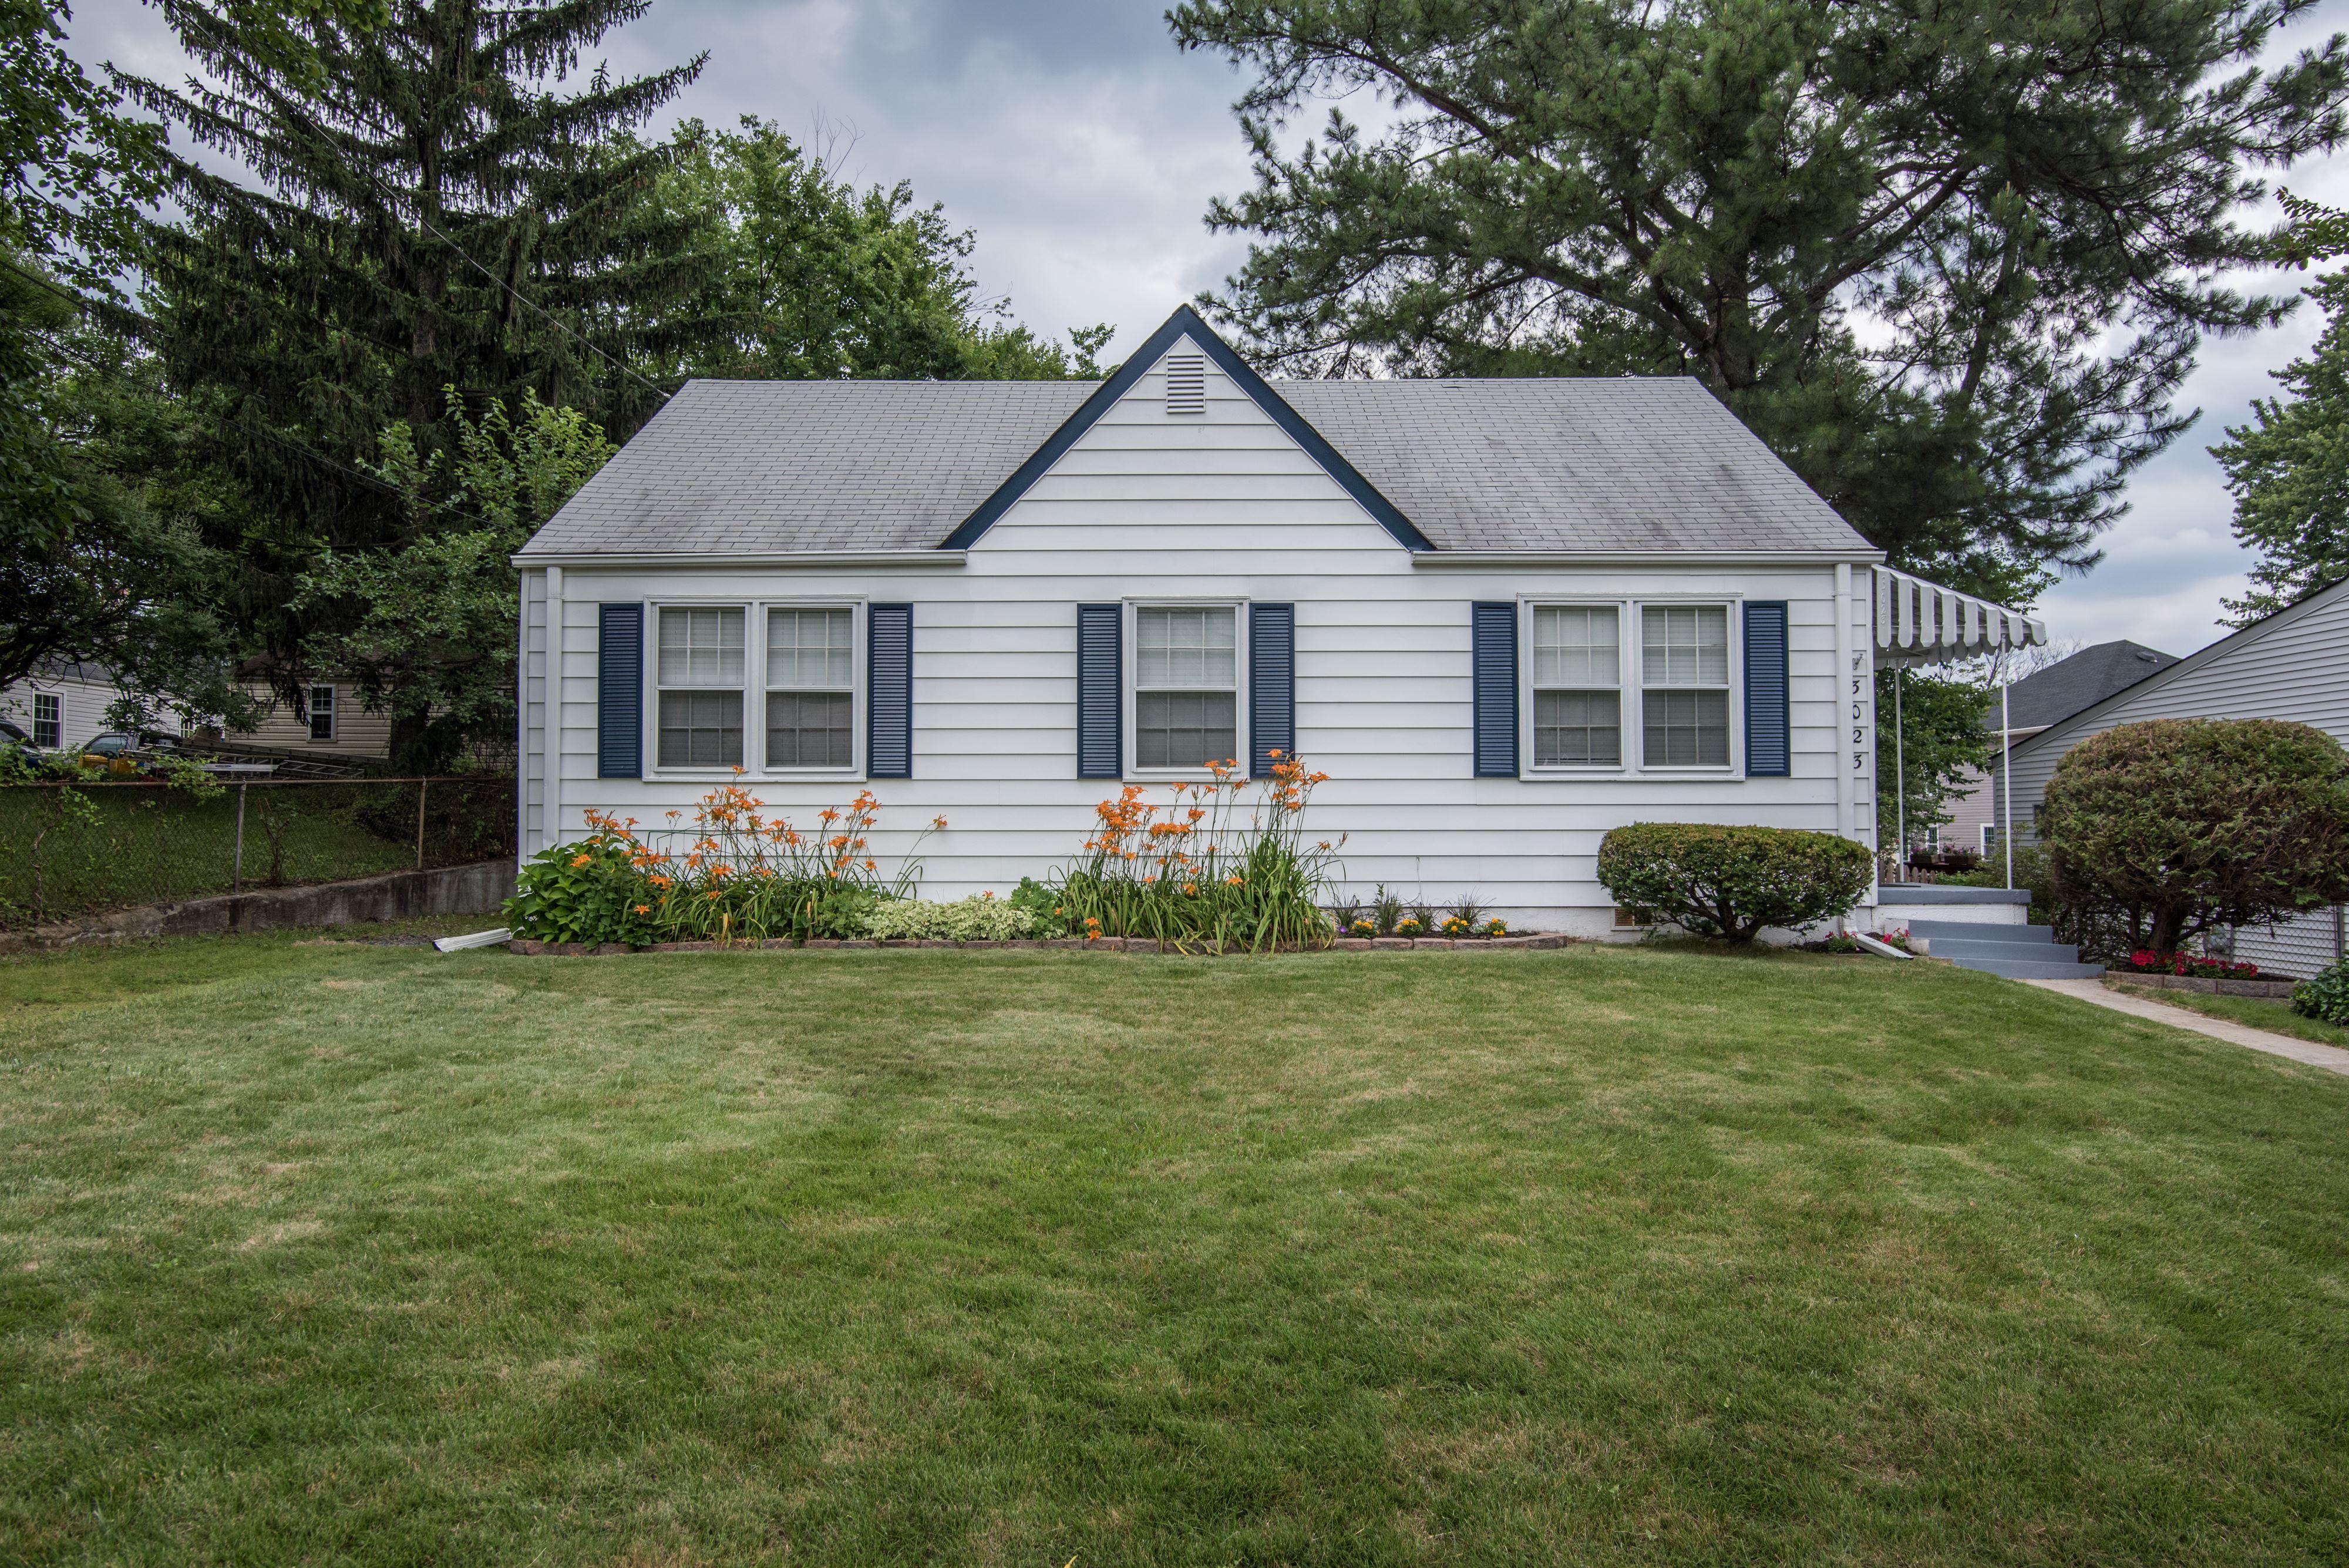 SOLD: Picture Perfect Cape Cod Home in Falls Church